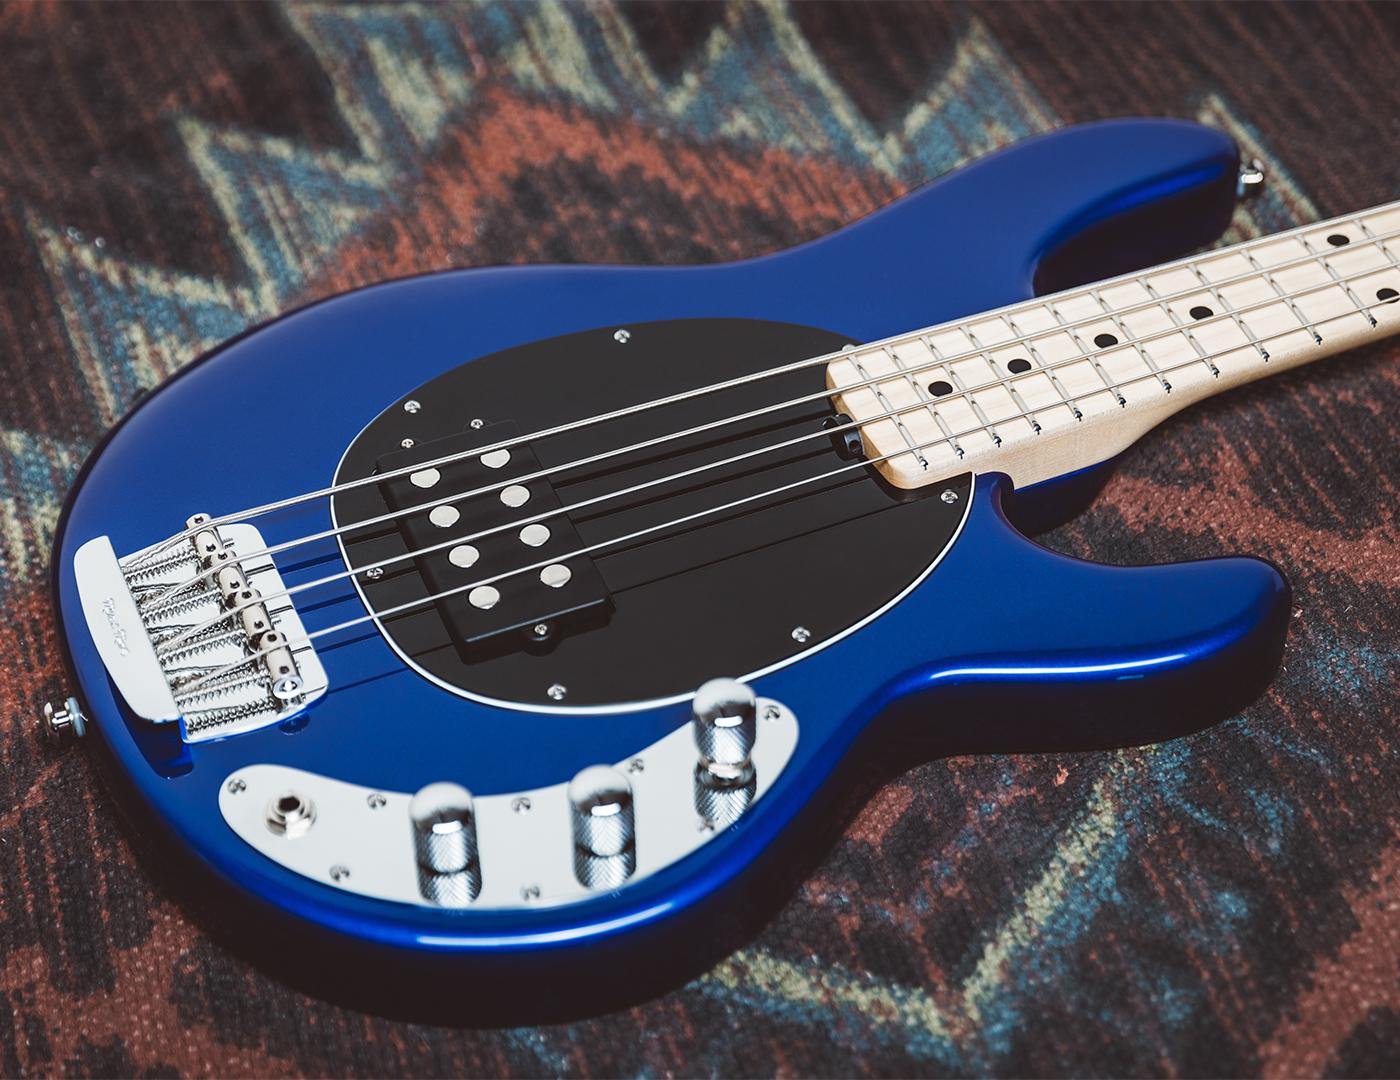 SS-StingRay-Bass-social-assets-Carousel-blue-1.jpg